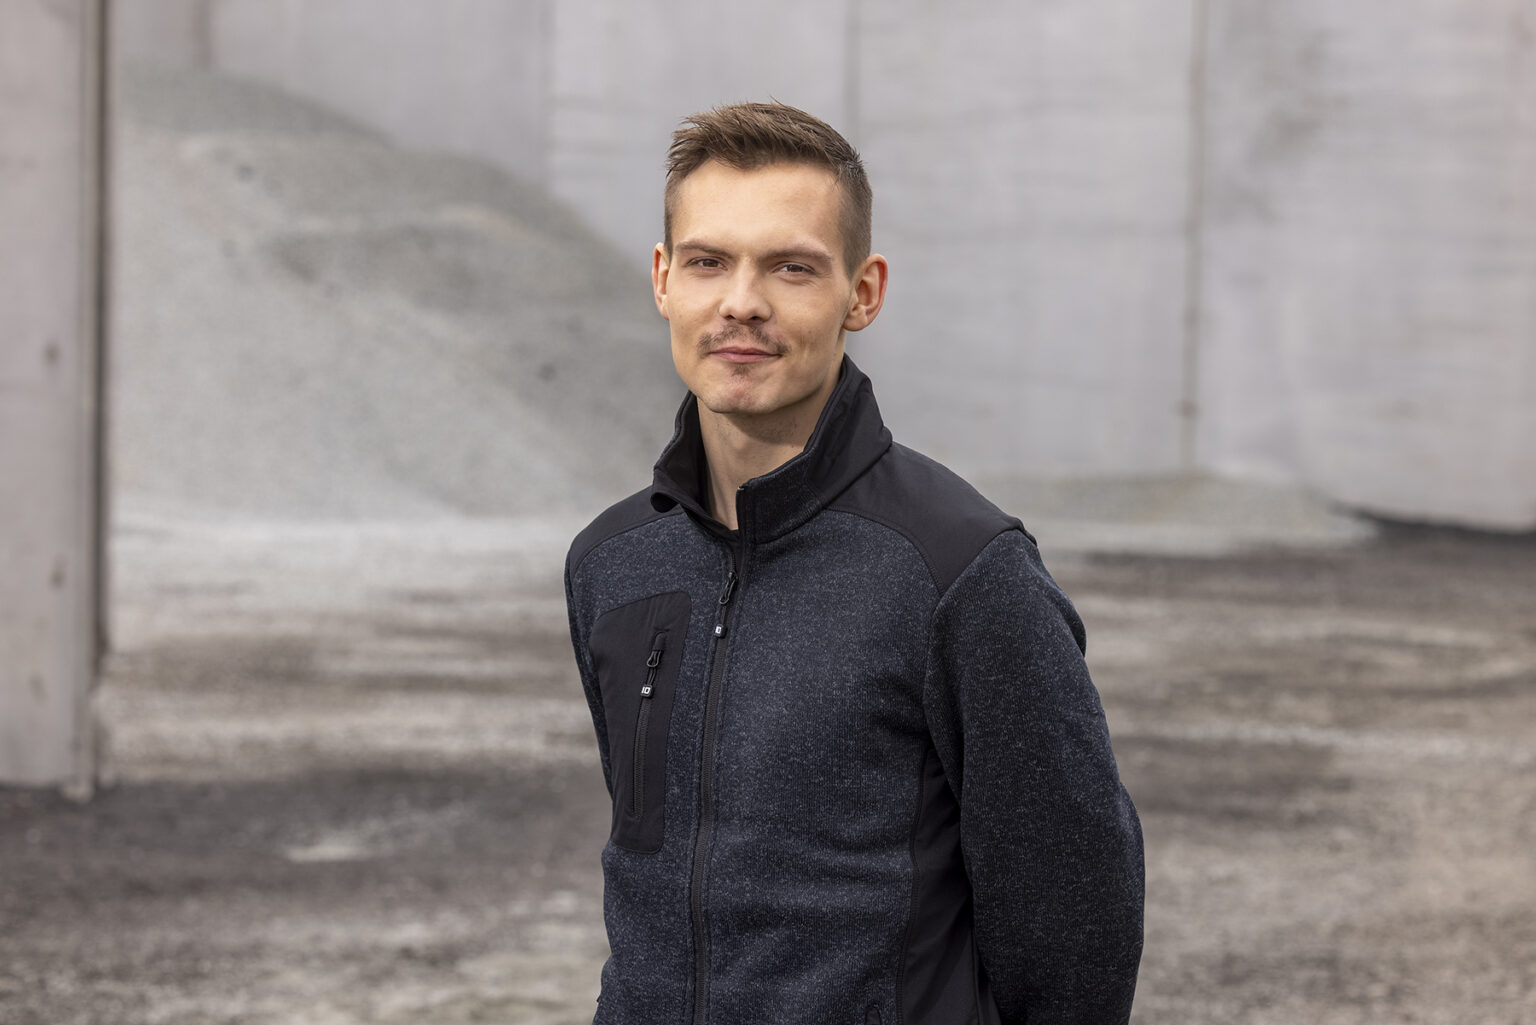 Sindri Kristján Magnússon